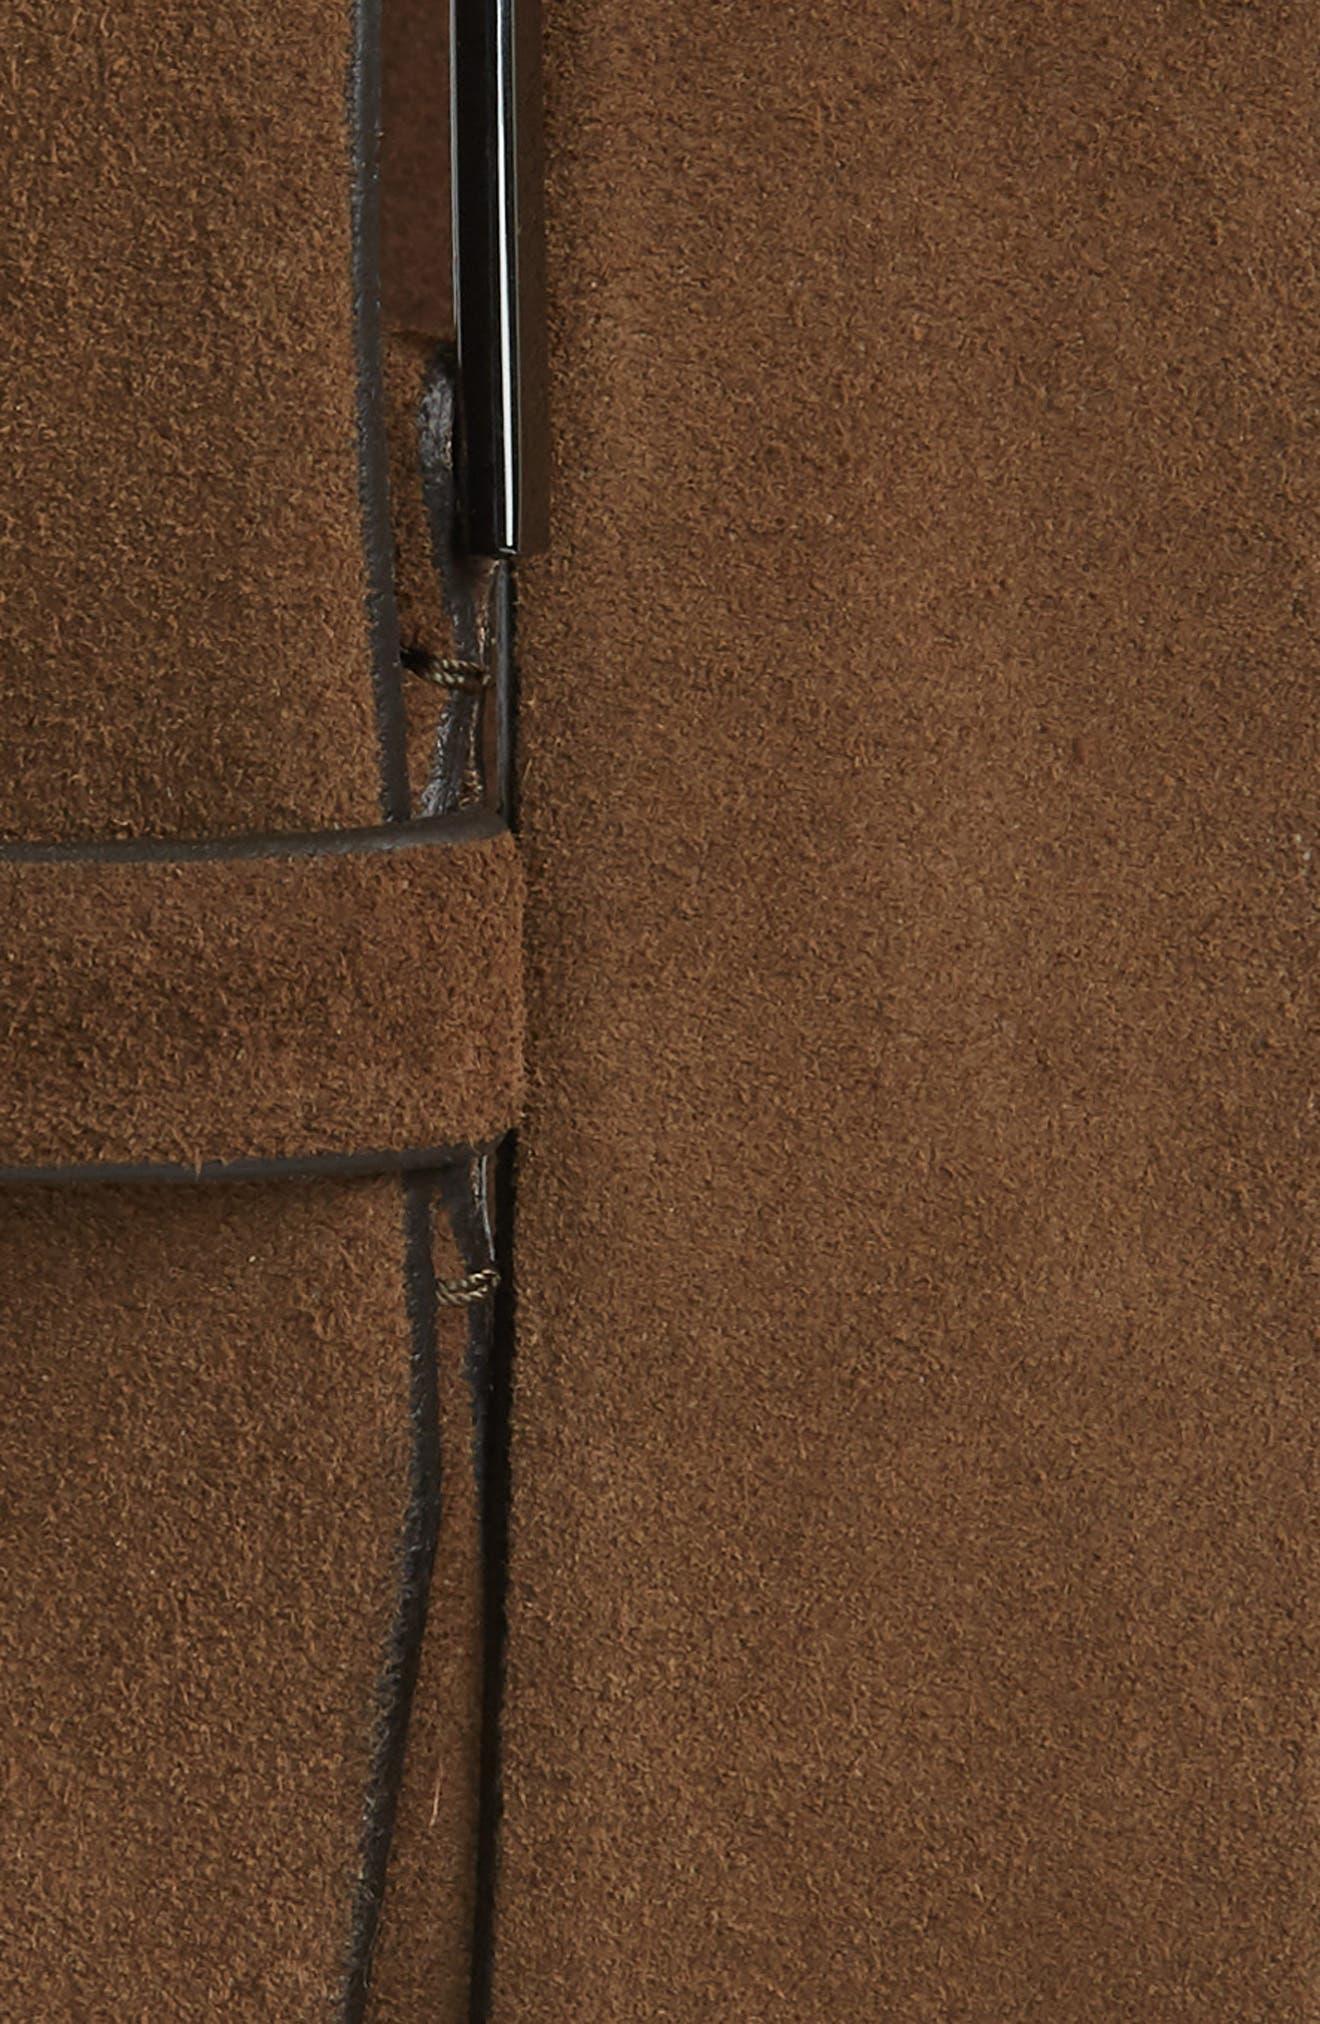 Calindo Suede Belt,                             Alternate thumbnail 2, color,                             Medium Brown